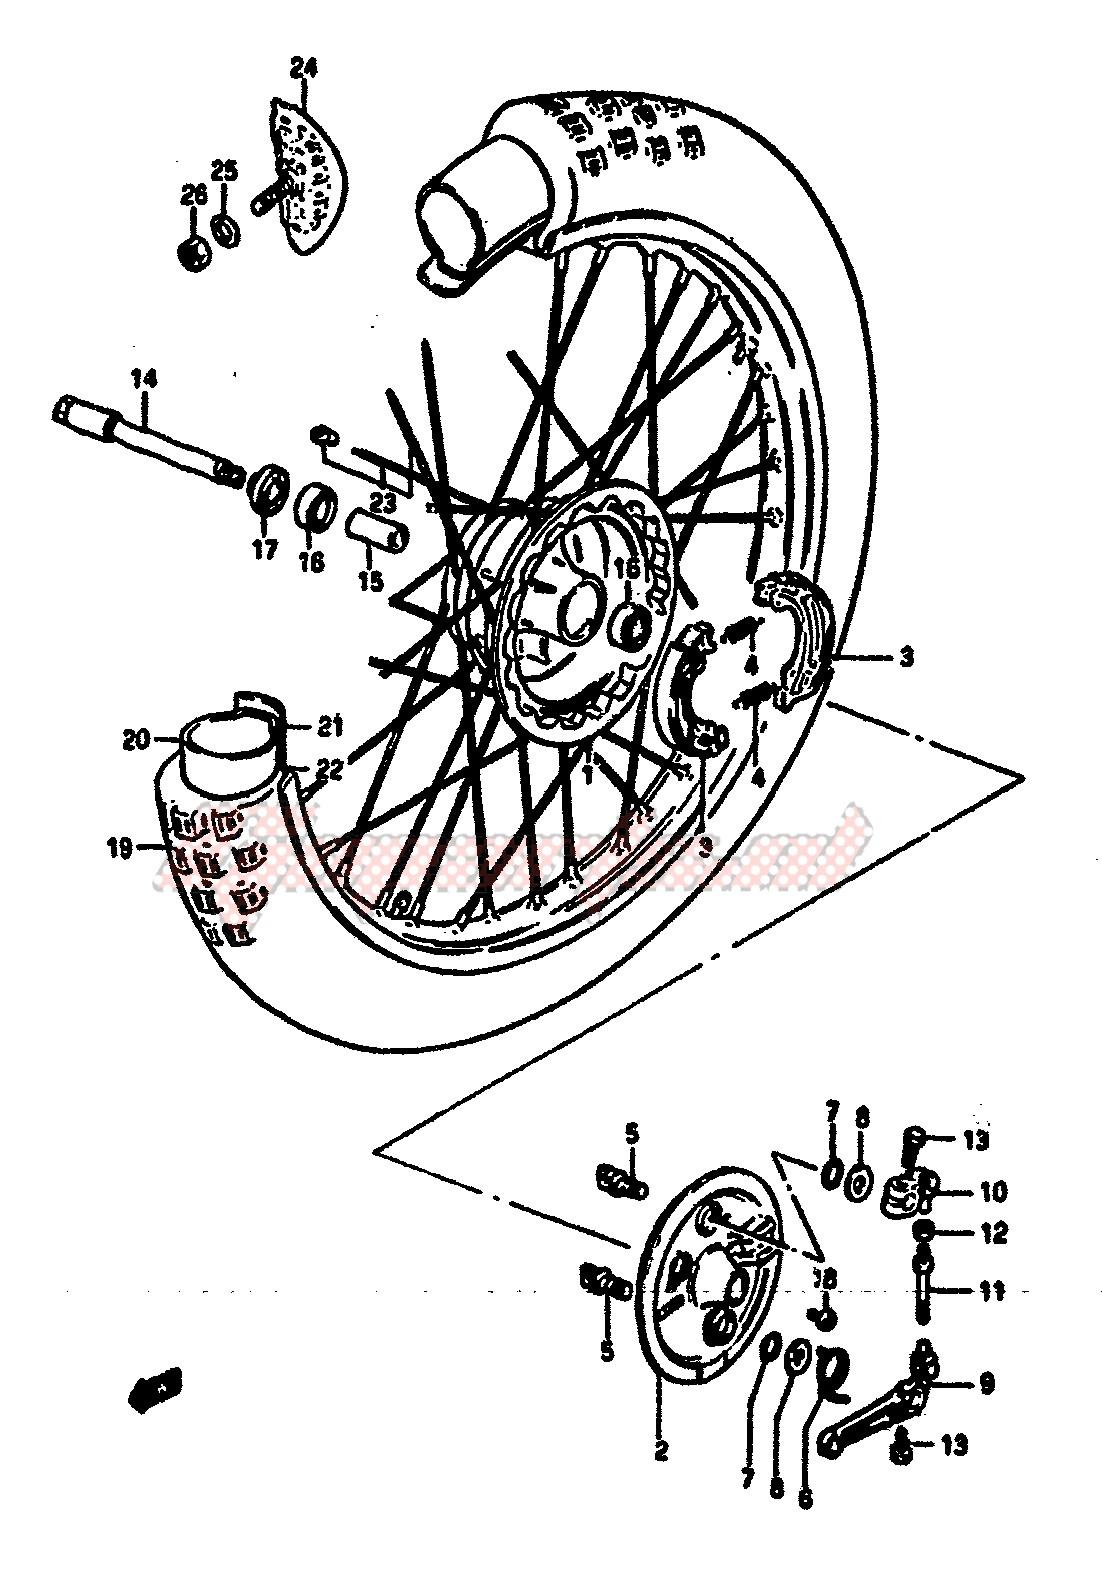 FRONT WHEEL (MODEL E) blueprint